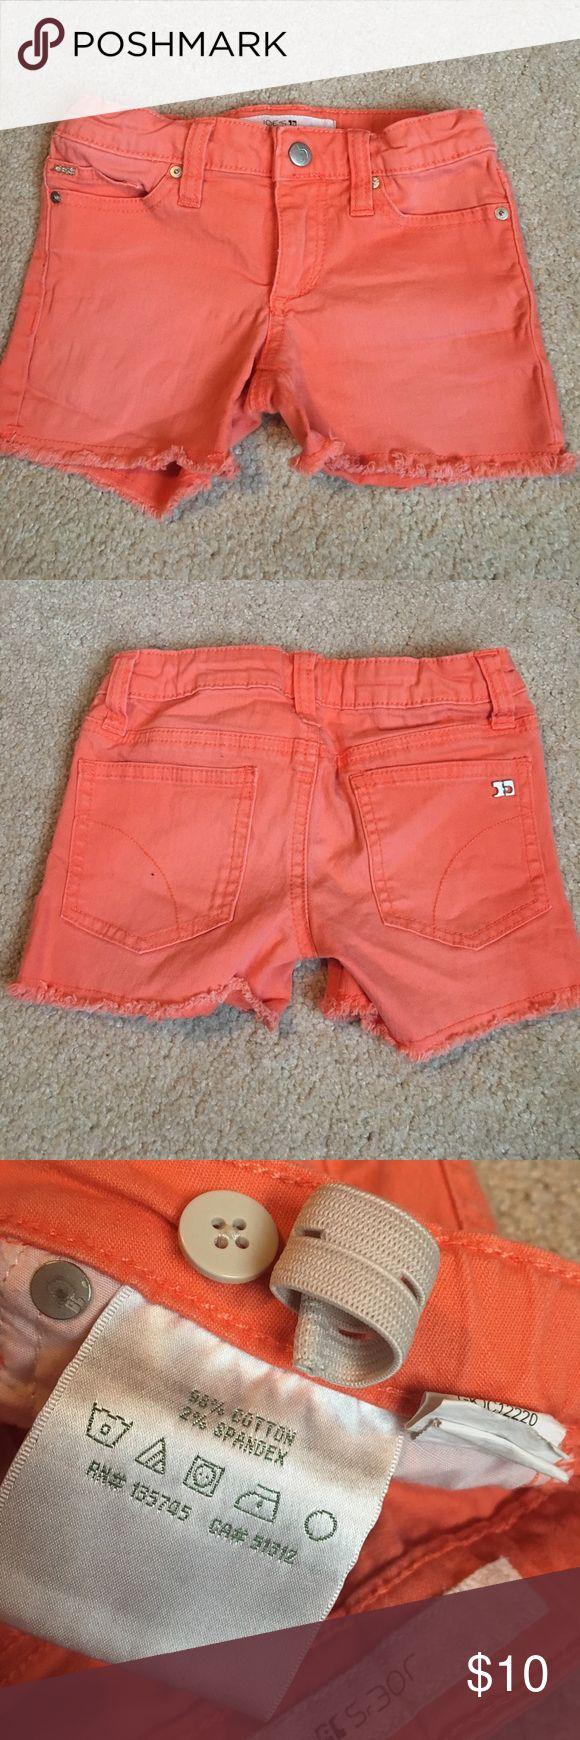 Joes jeans girls shorts Orange shorts by Joes Jeans, size 5. Adjustable waistband, 98% cotton, 2% spandex Joe's Jeans Bottoms Shorts